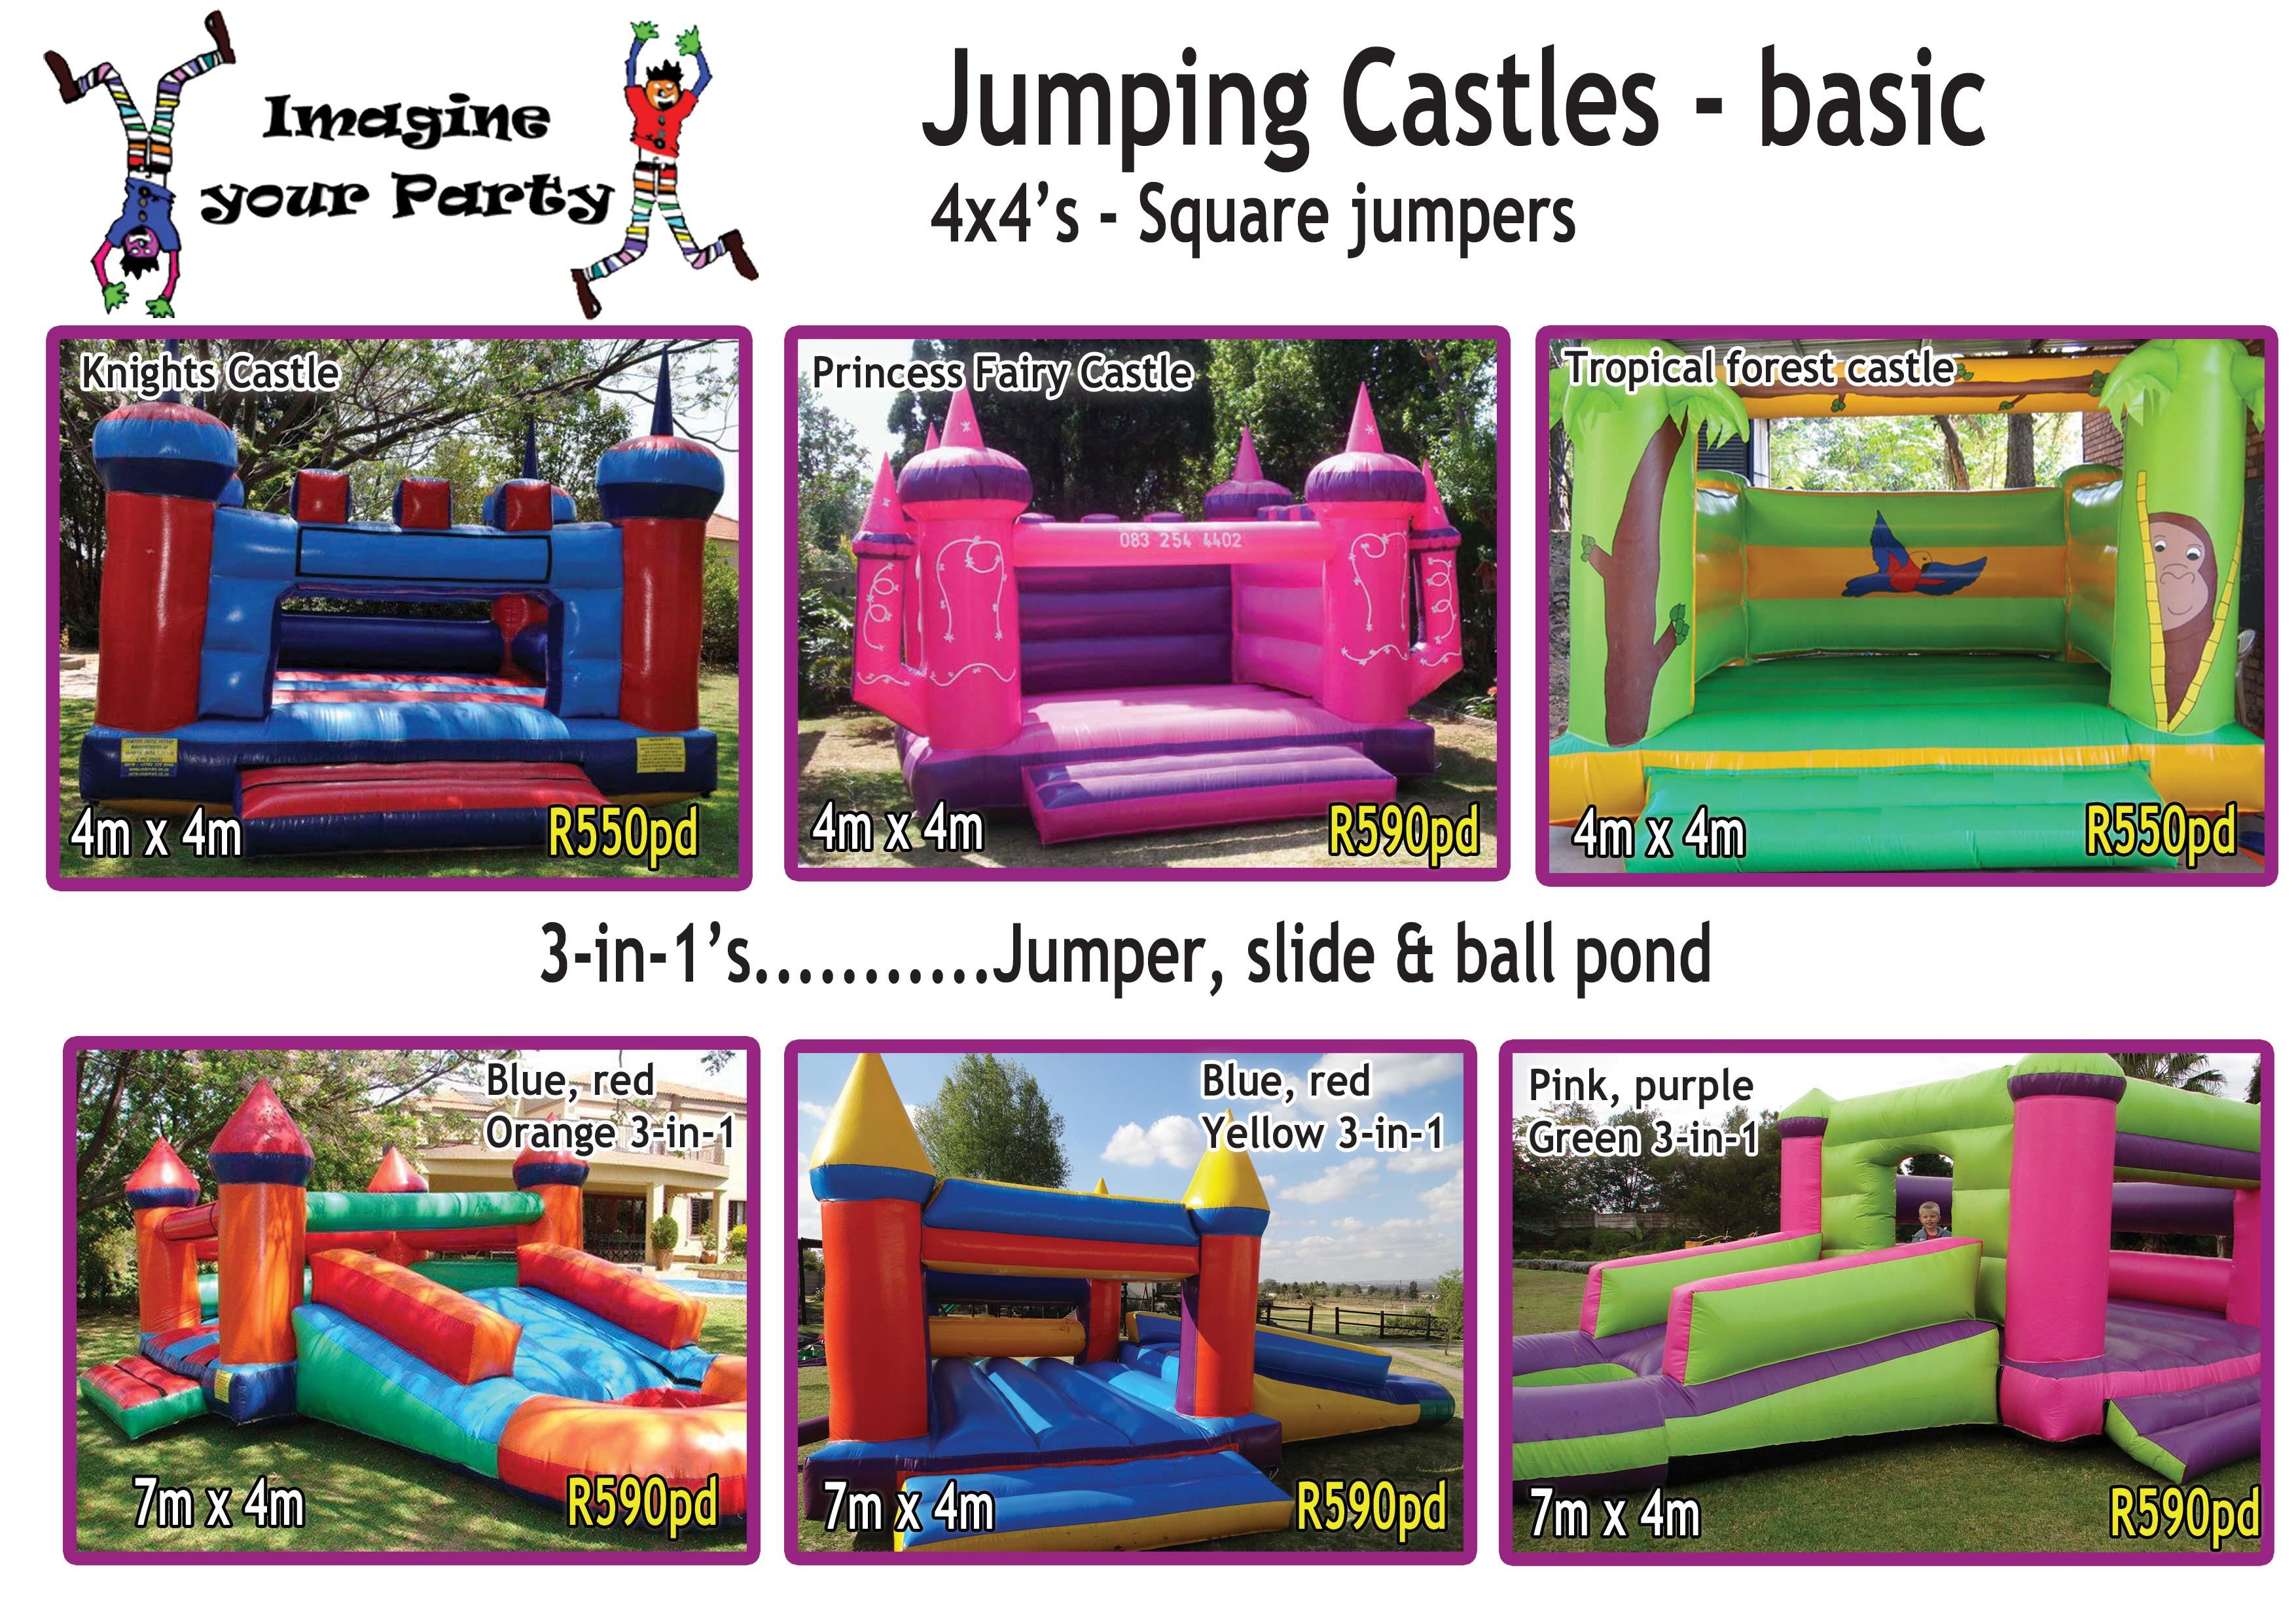 Photo-Album_jumping-castles-basic_2018_Imagine